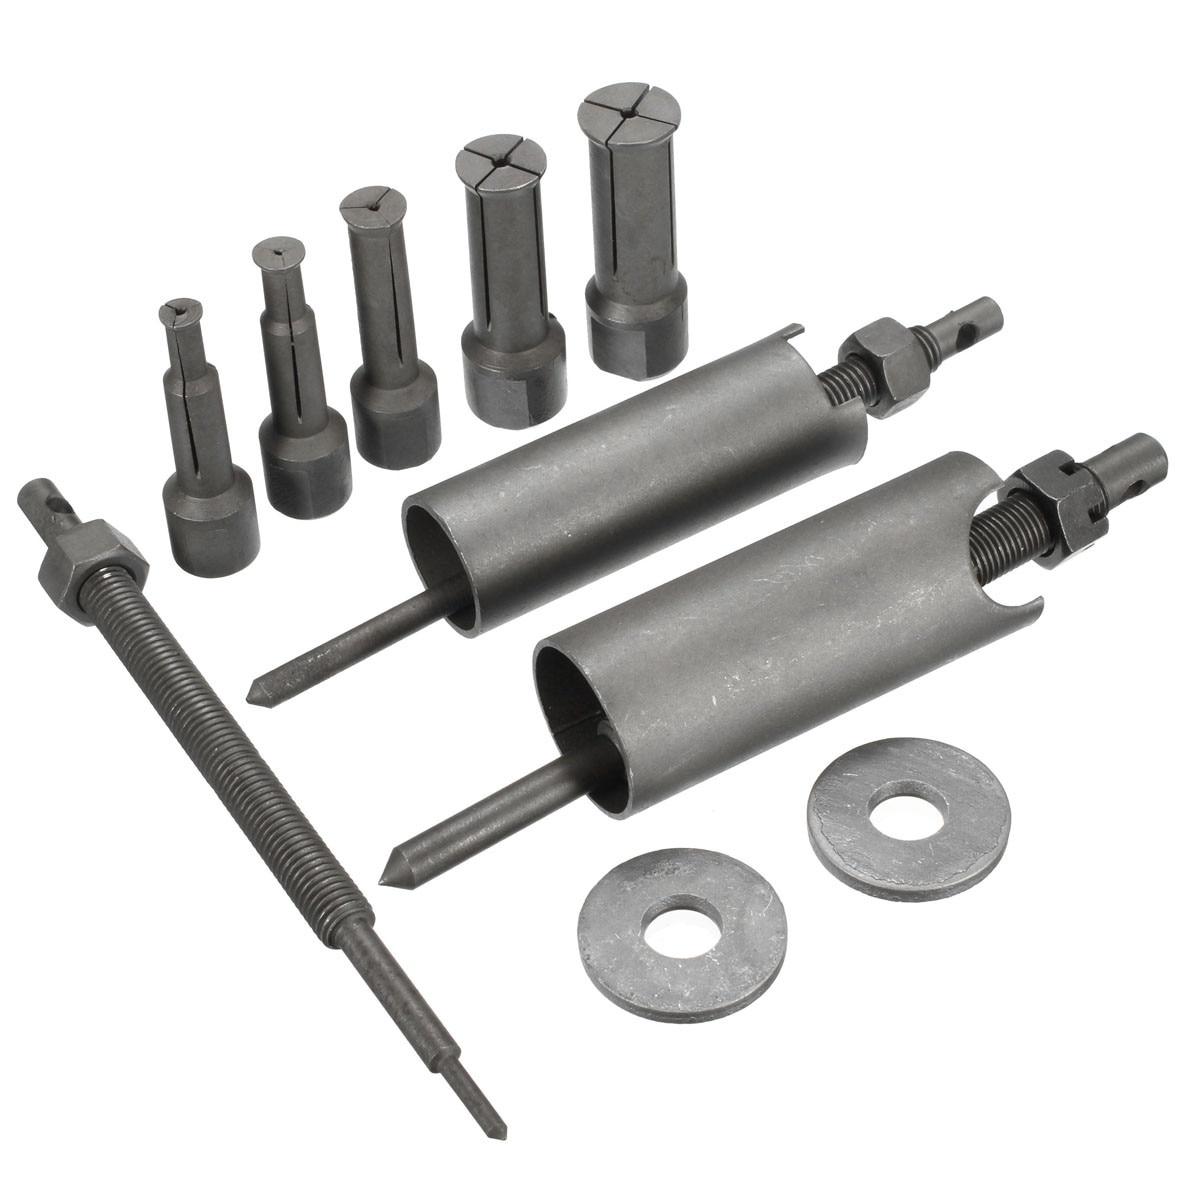 1 компл. внутренняя подшипника инструмент для снятия Комплект для авто мотоцикл от 9 мм до 23 мм Диаметр